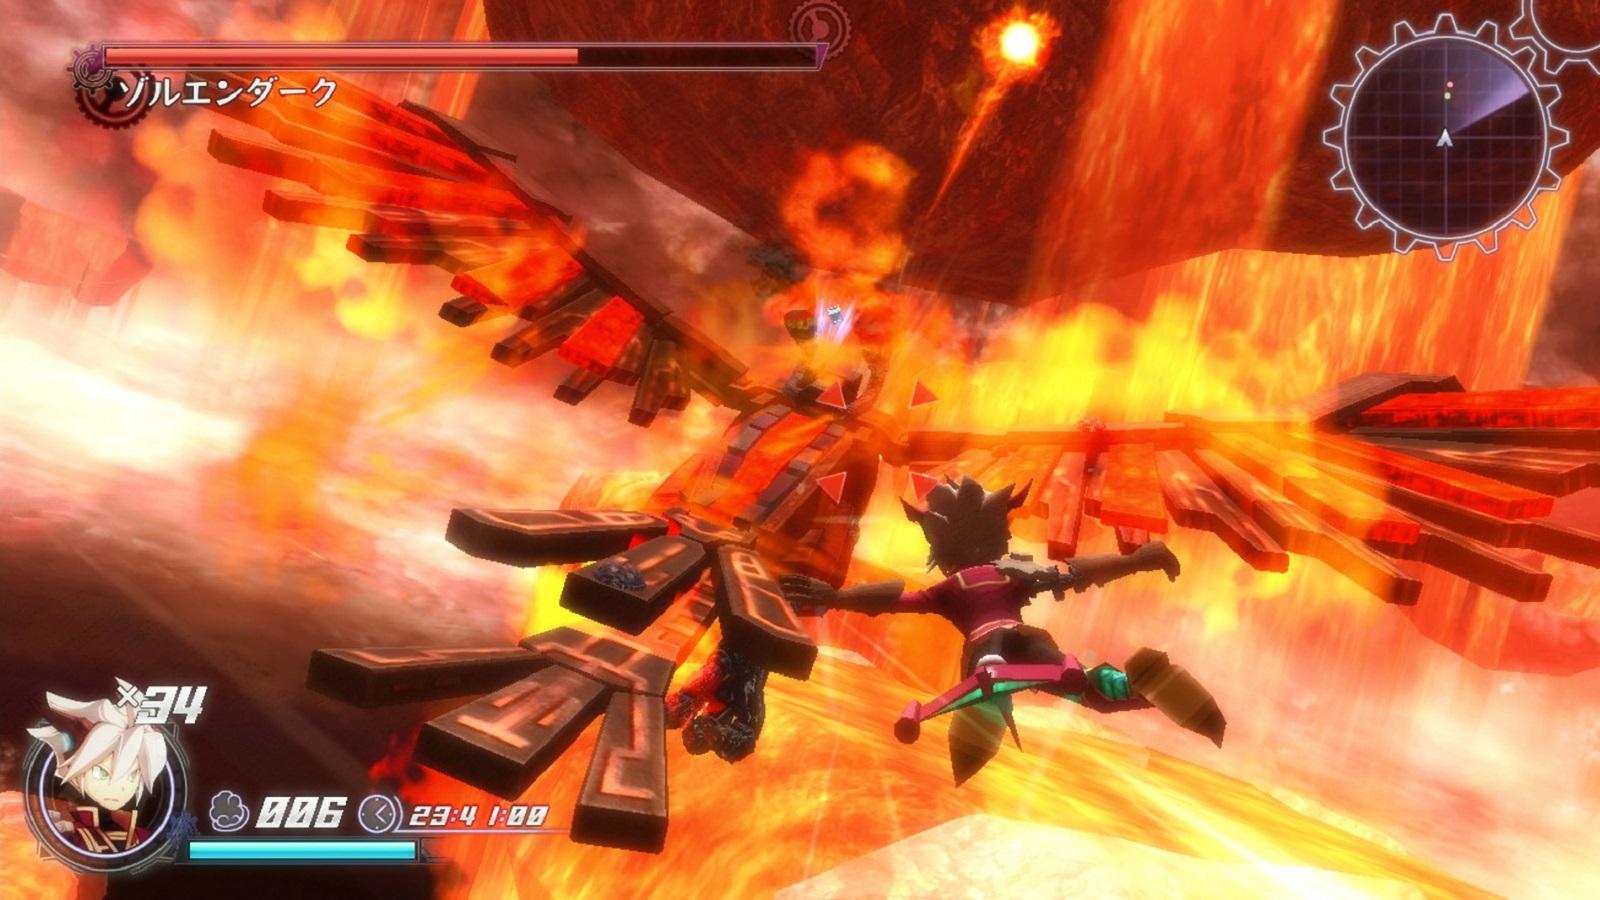 Rodea: Sky Soldier Gameplay Screenshot Rise of the Phoenix WiiU 3DS